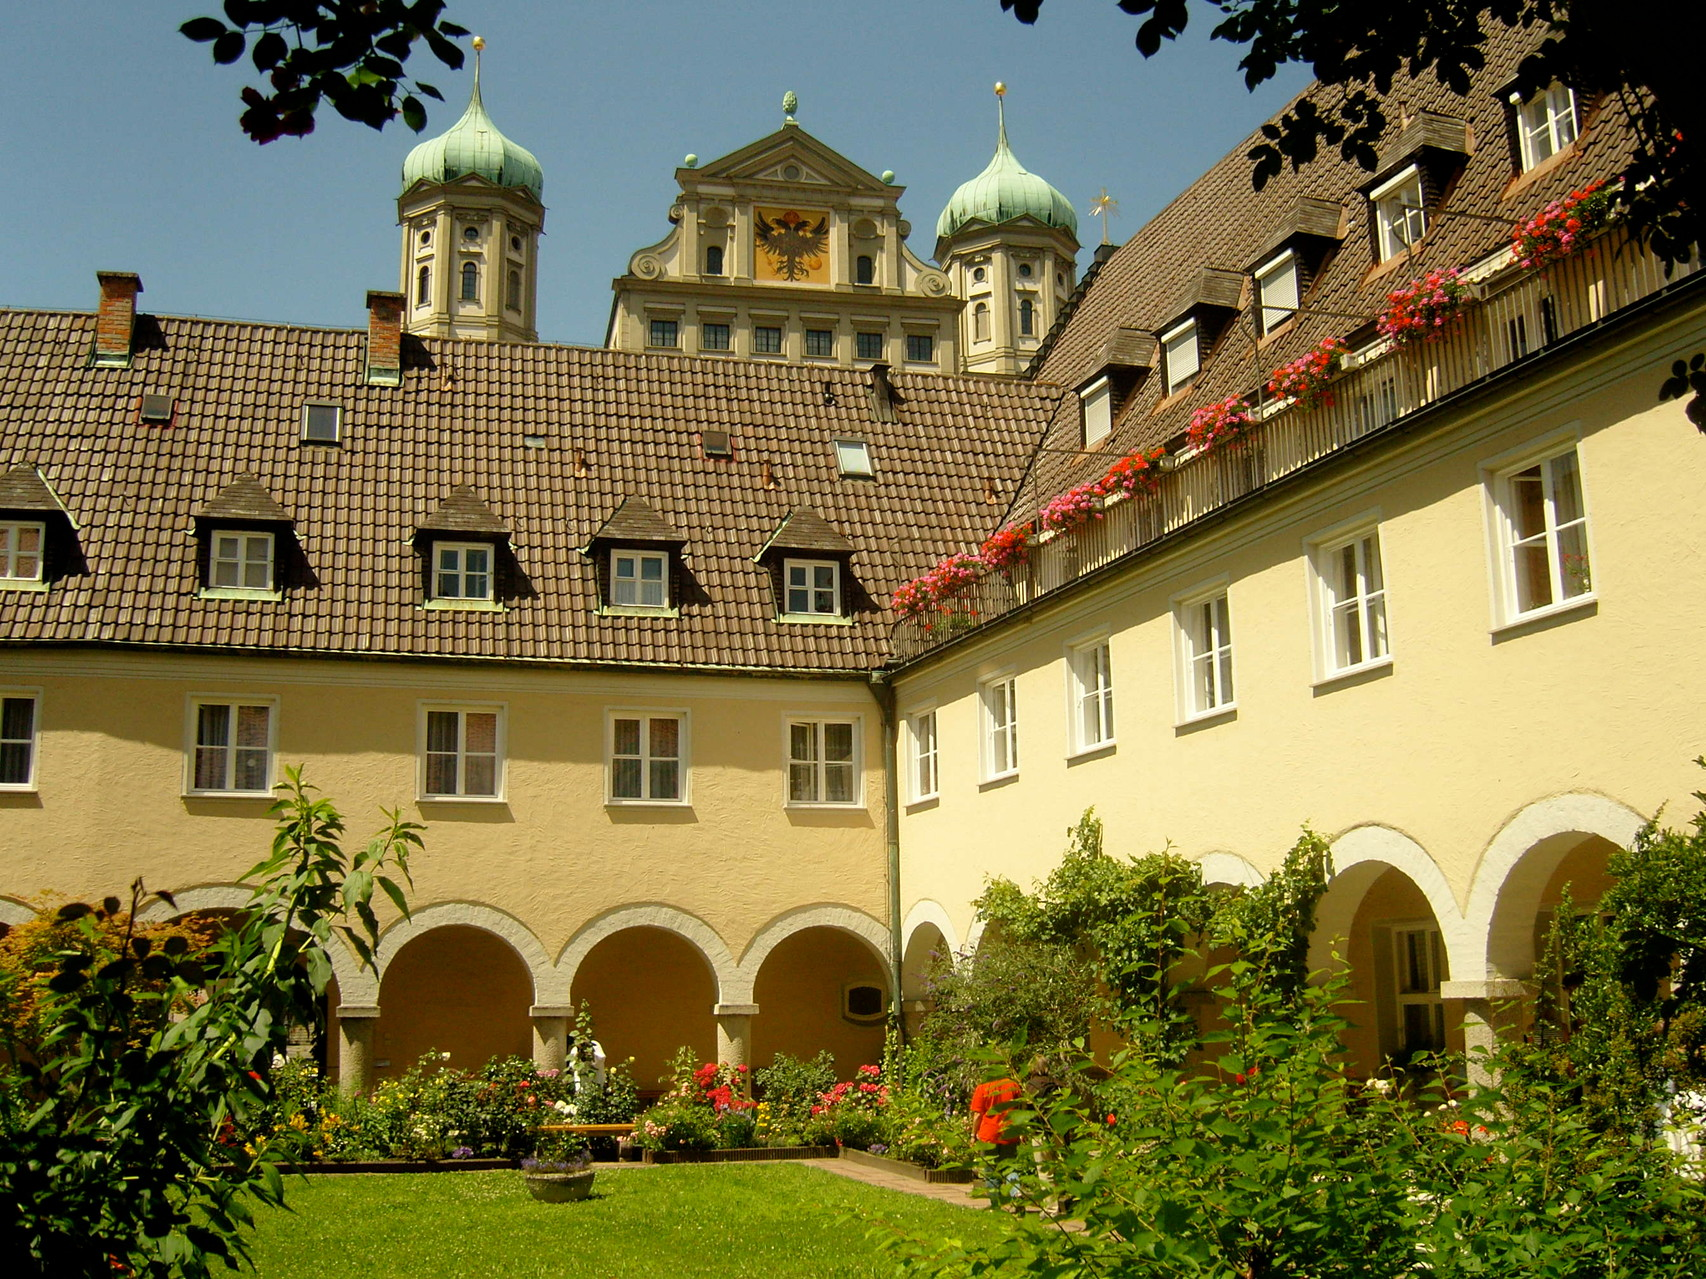 Kloster Maria Stern - Kreuzgang mit Blick auf 5 Türme